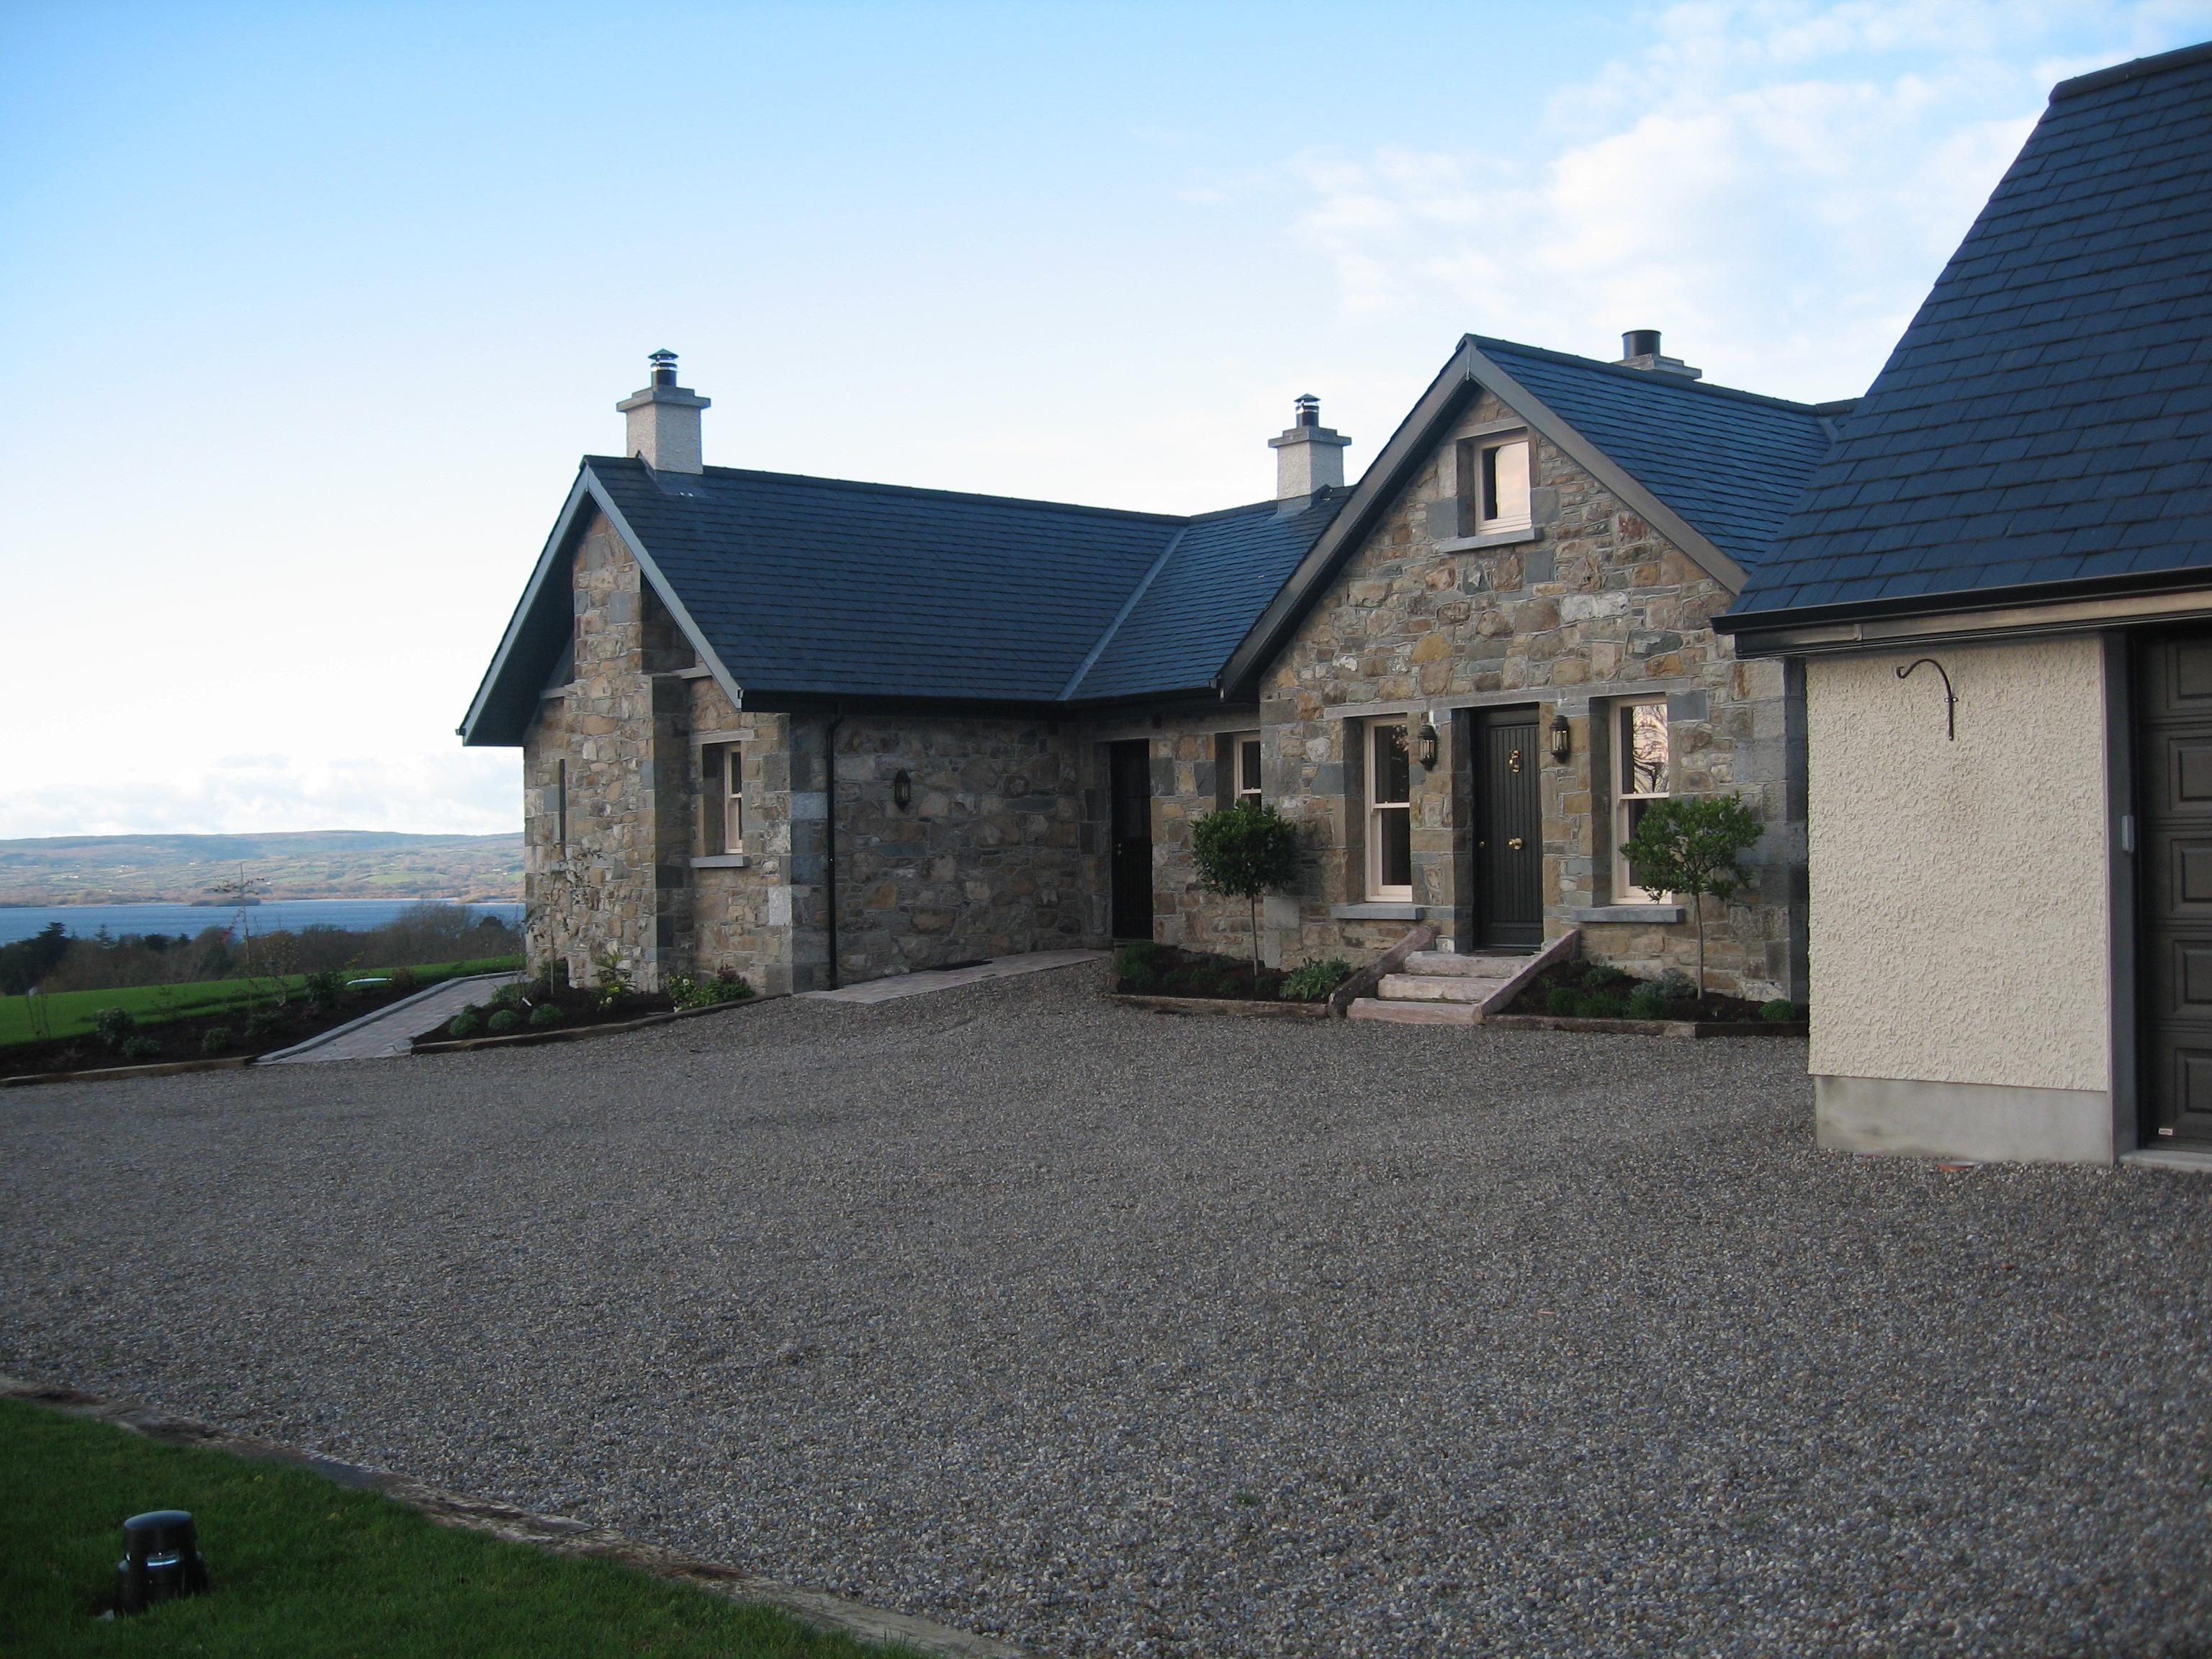 Ireland Stone Building : Conor fitzgerald stonemason nenagh co tipperary